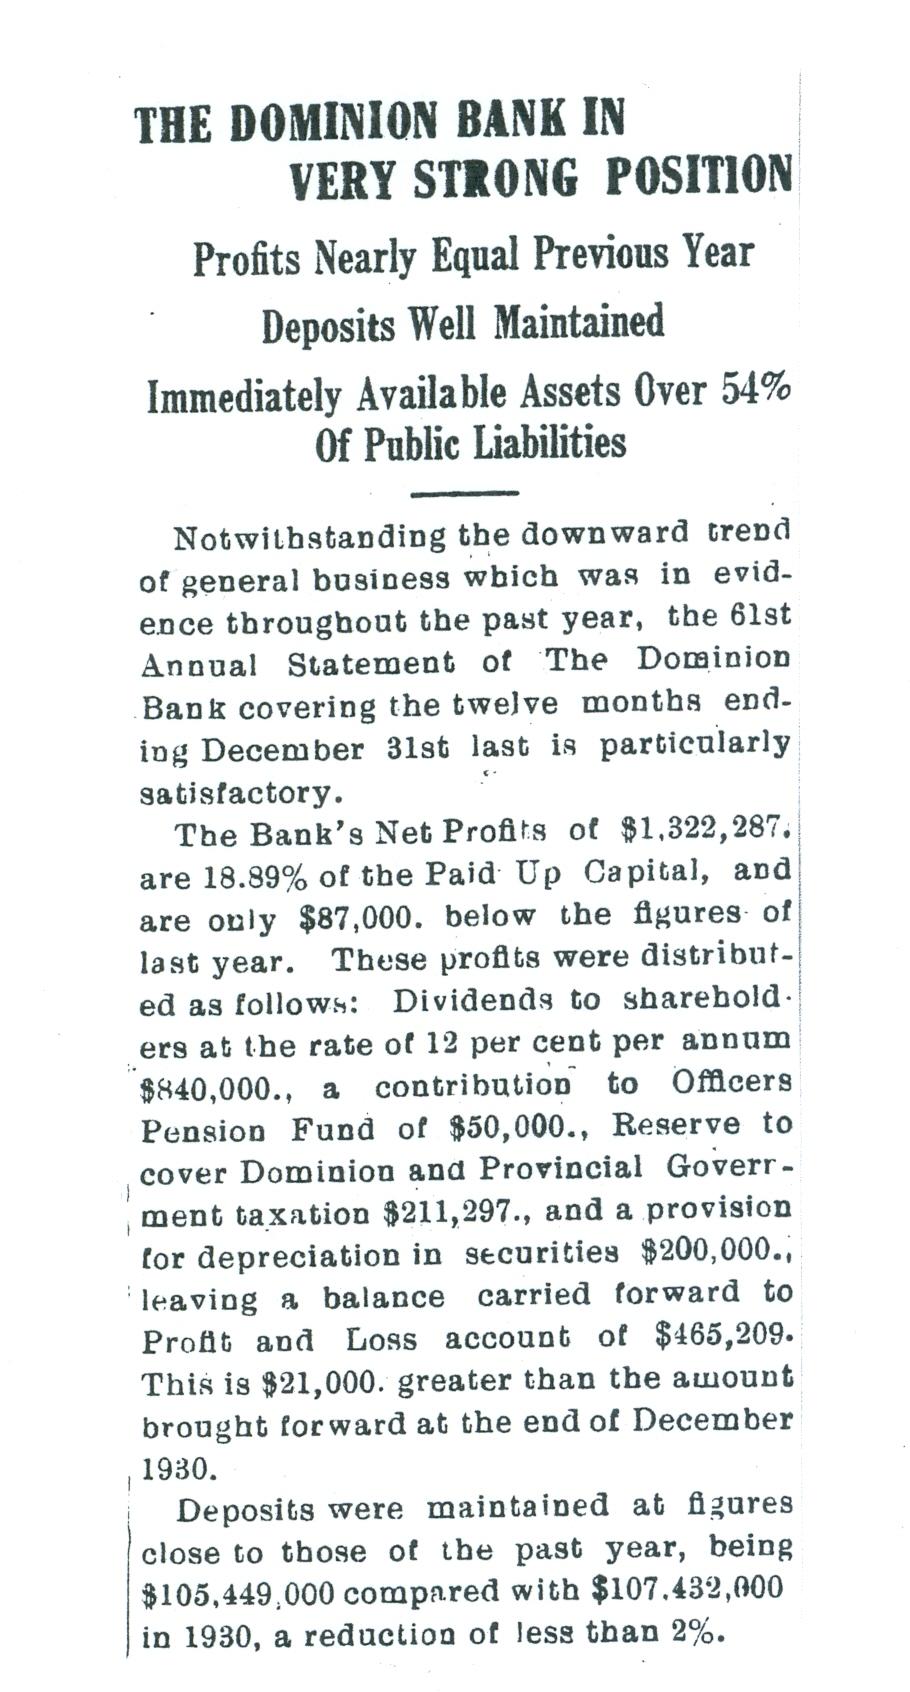 Feb. 4, 1932